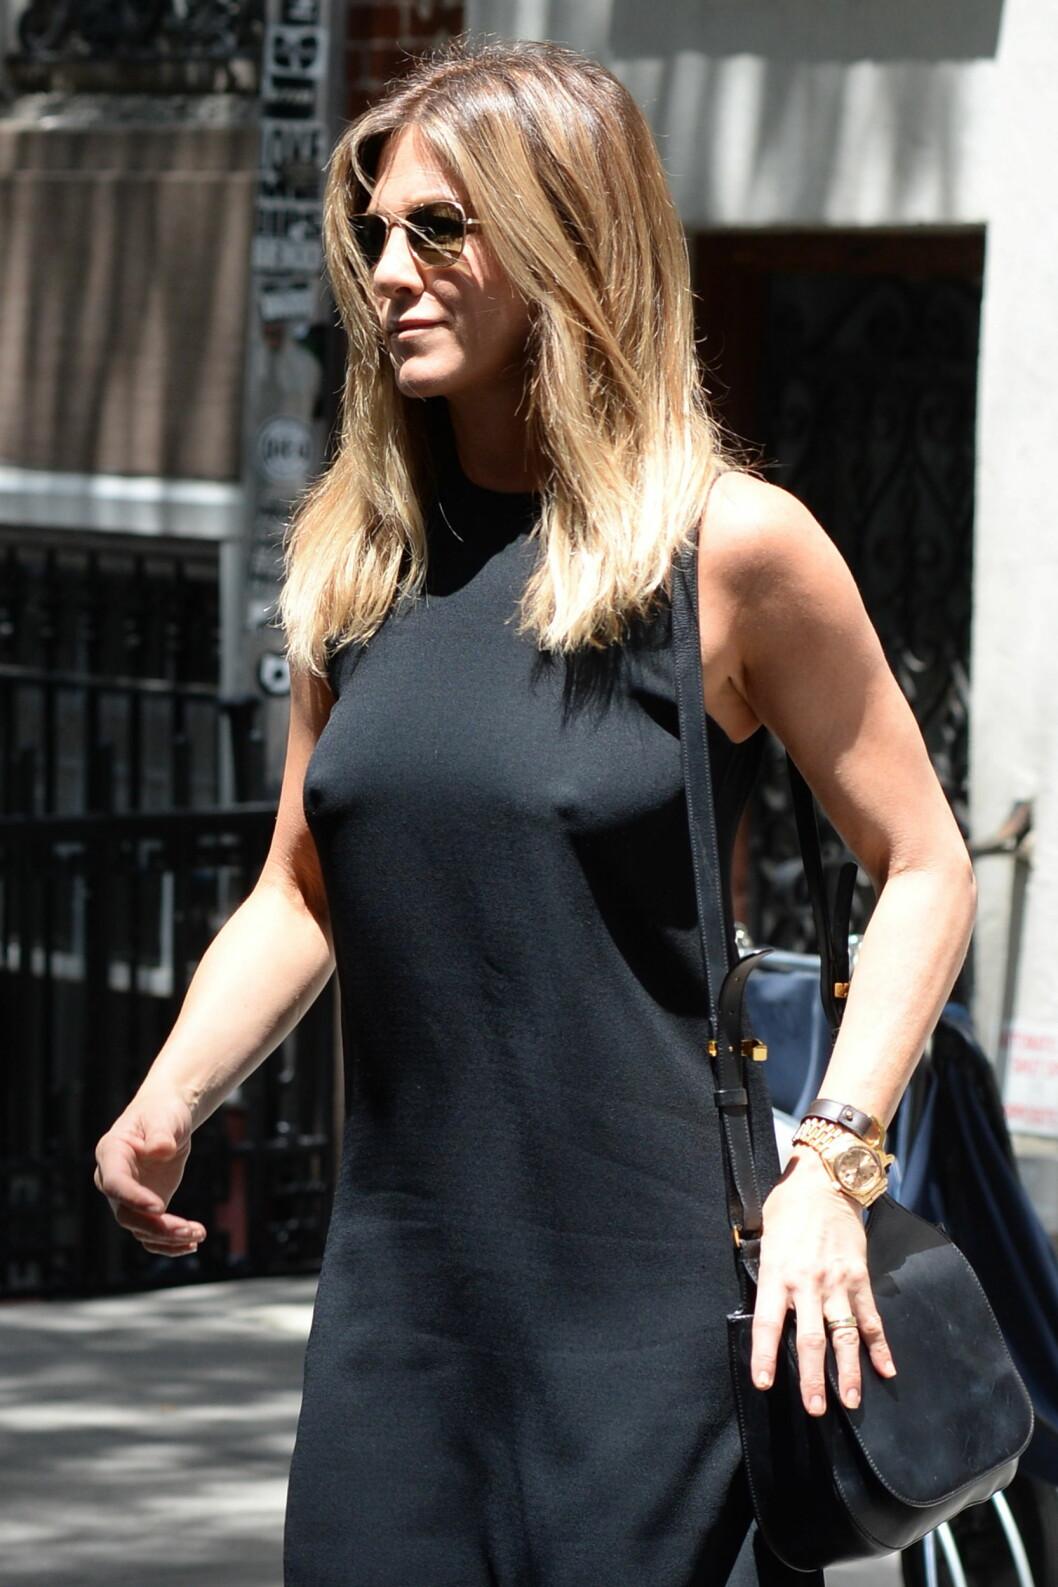 June 30, 2016 - New York, NY, USA - June 30, 2016 New York City..Jennifer Aniston seen walking ing the West Village in New York City on June 30, 2016. Foto: Zuma Press